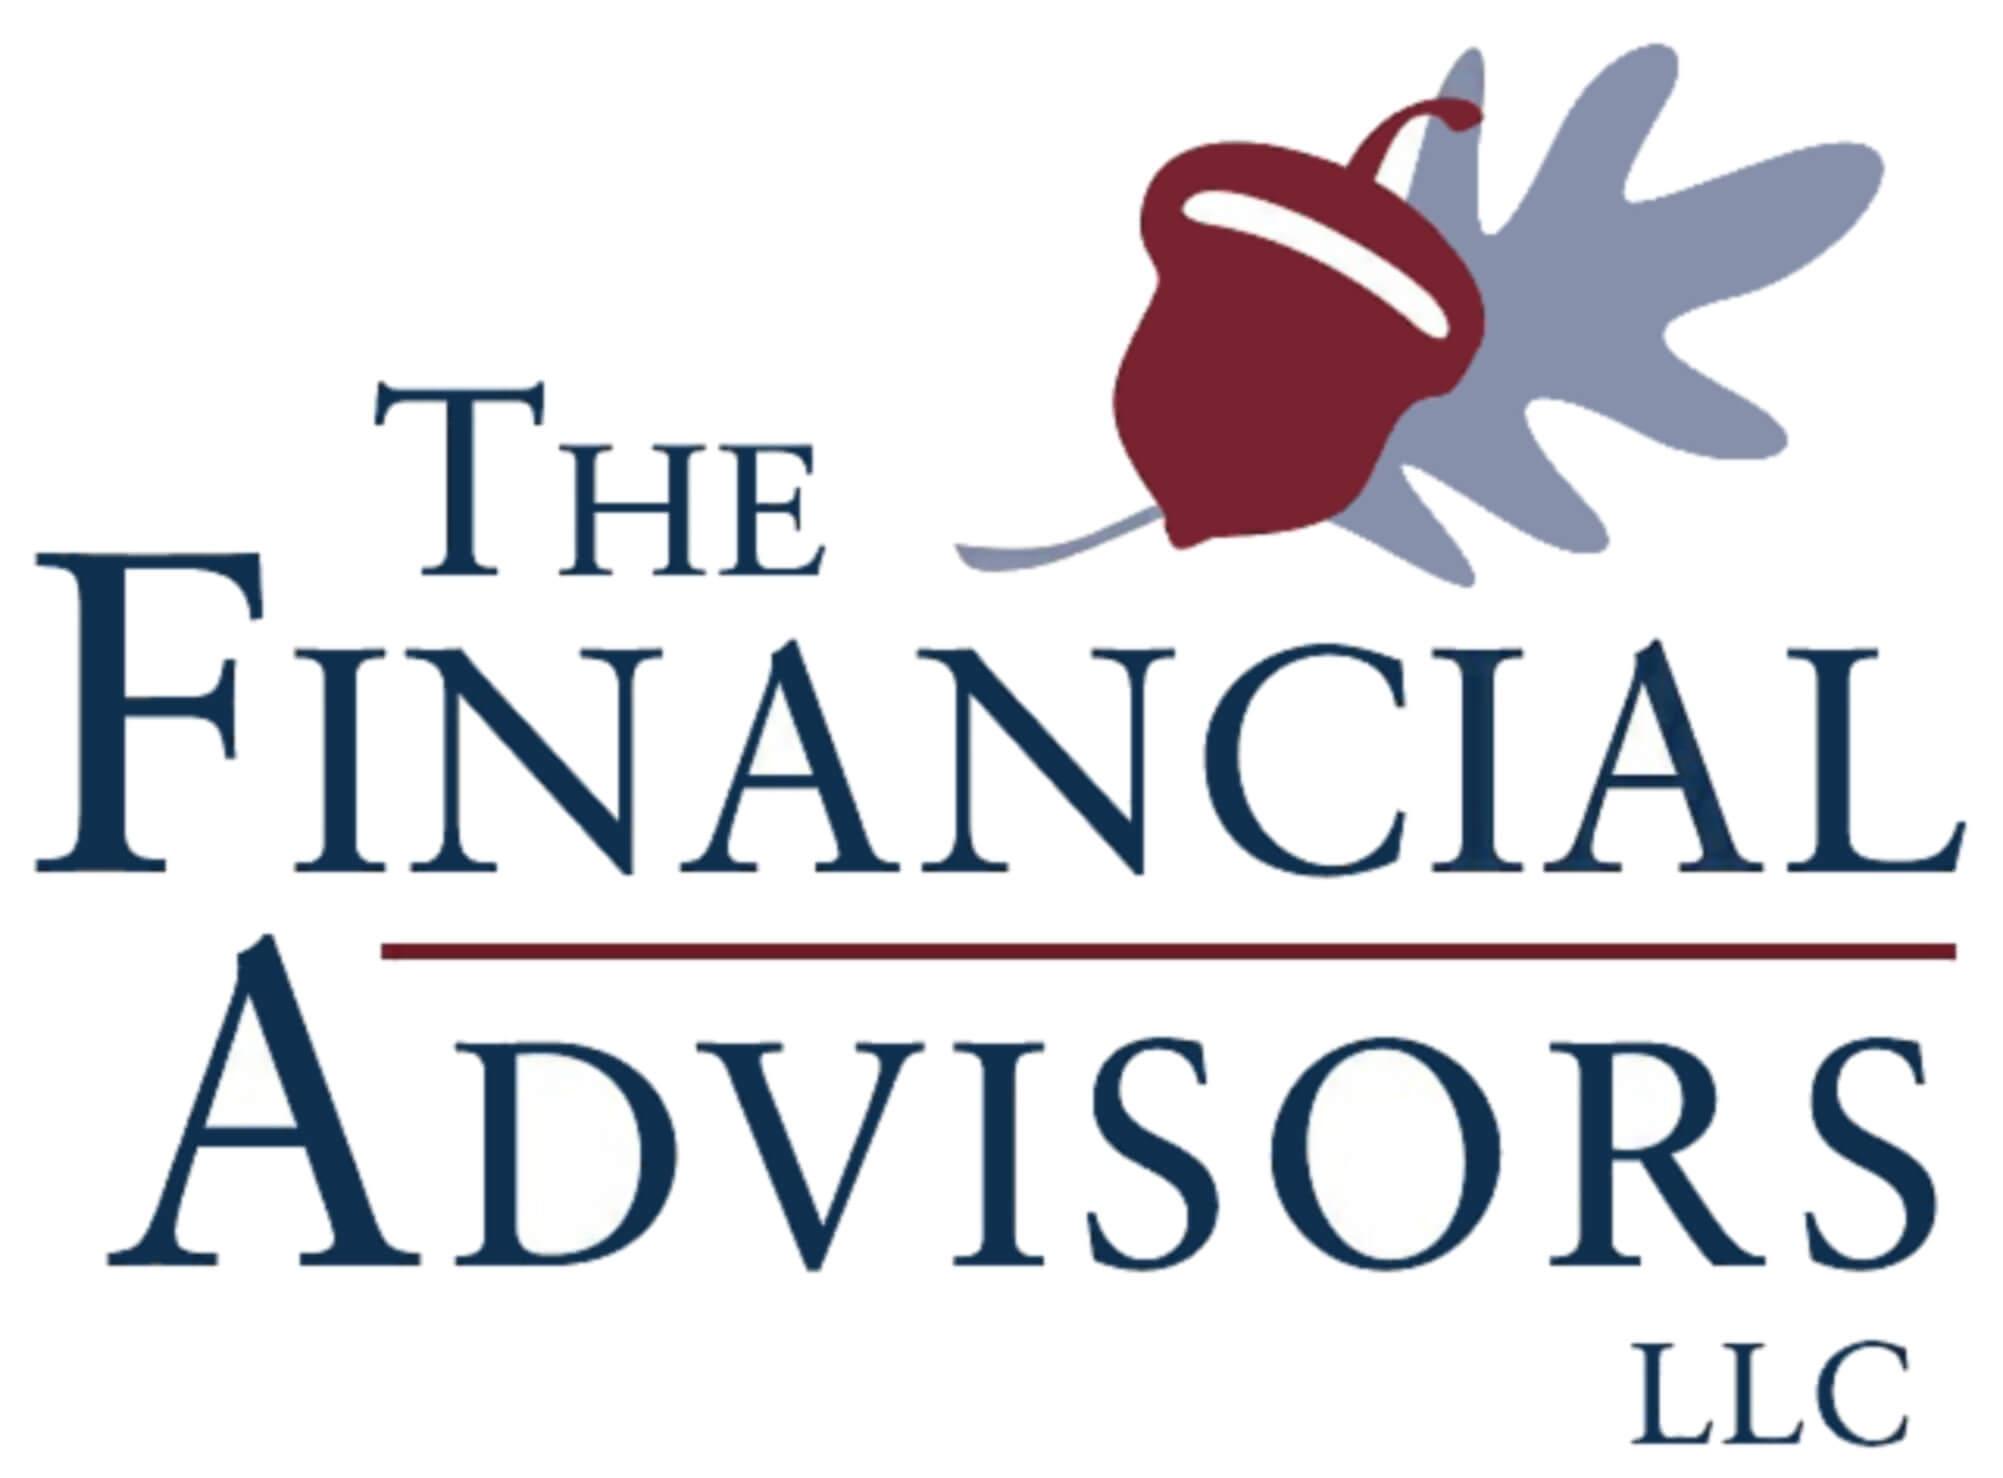 The Financial Advisors